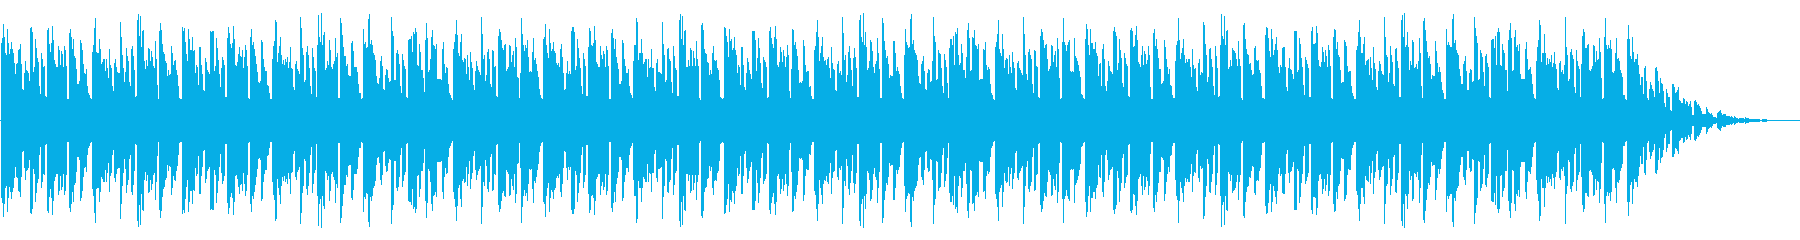 GB風レースゲームのED曲の再生済みの波形